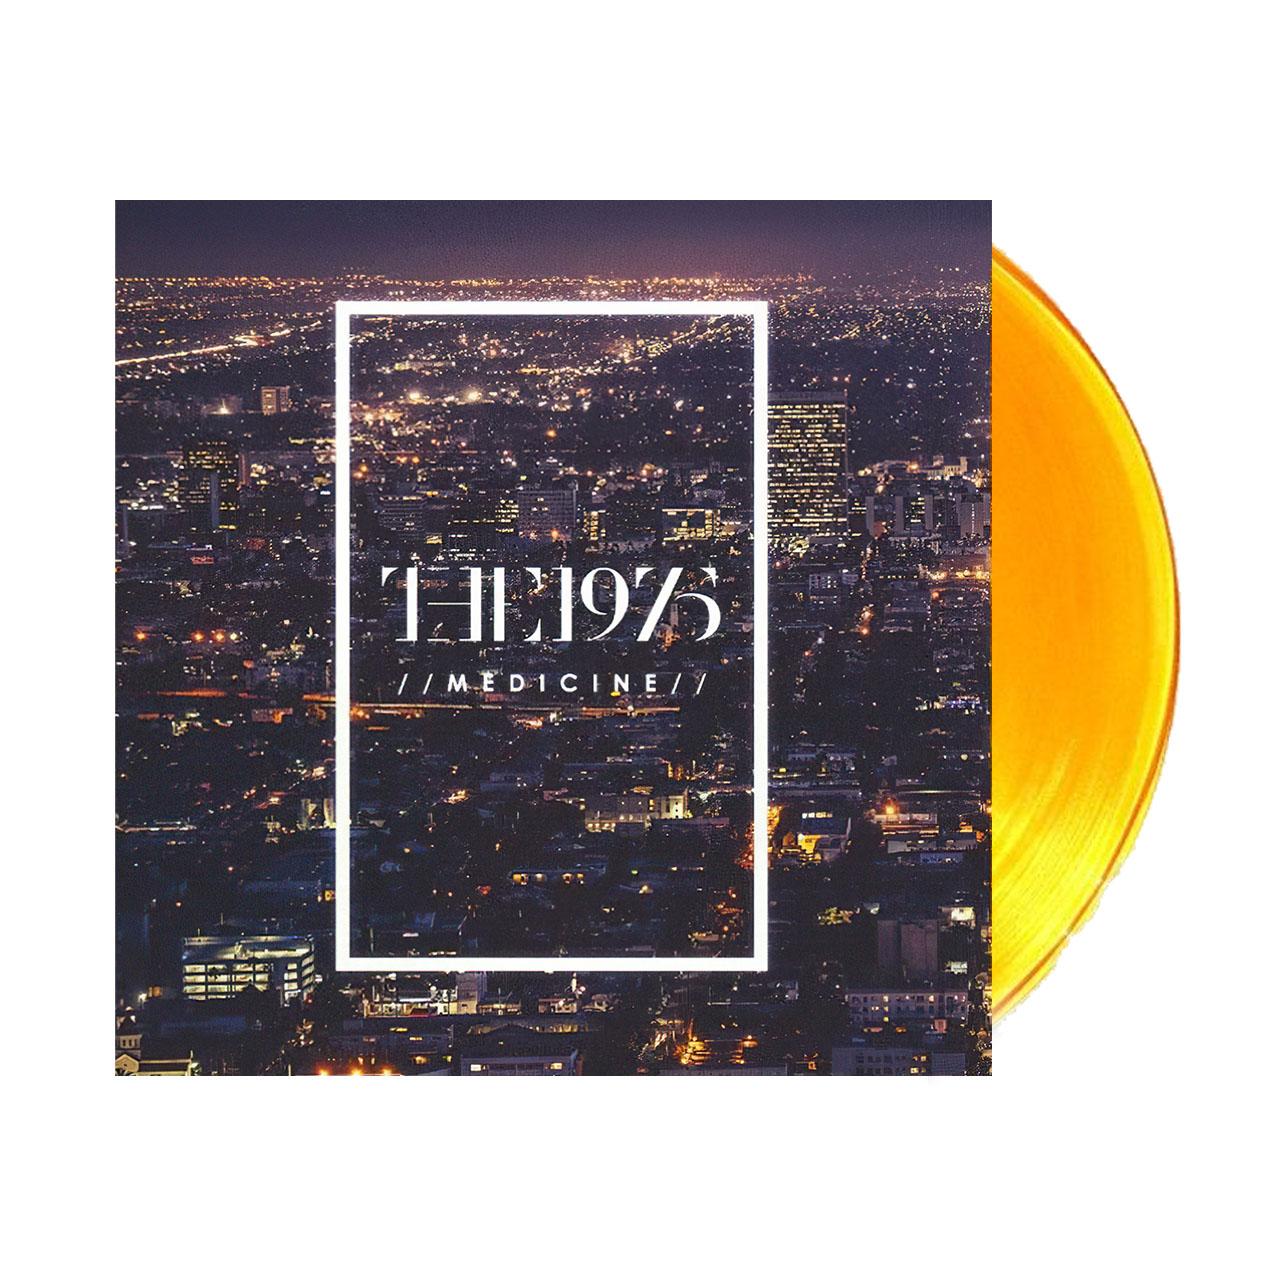 THE 1975 Medicine 7″ Vinyl